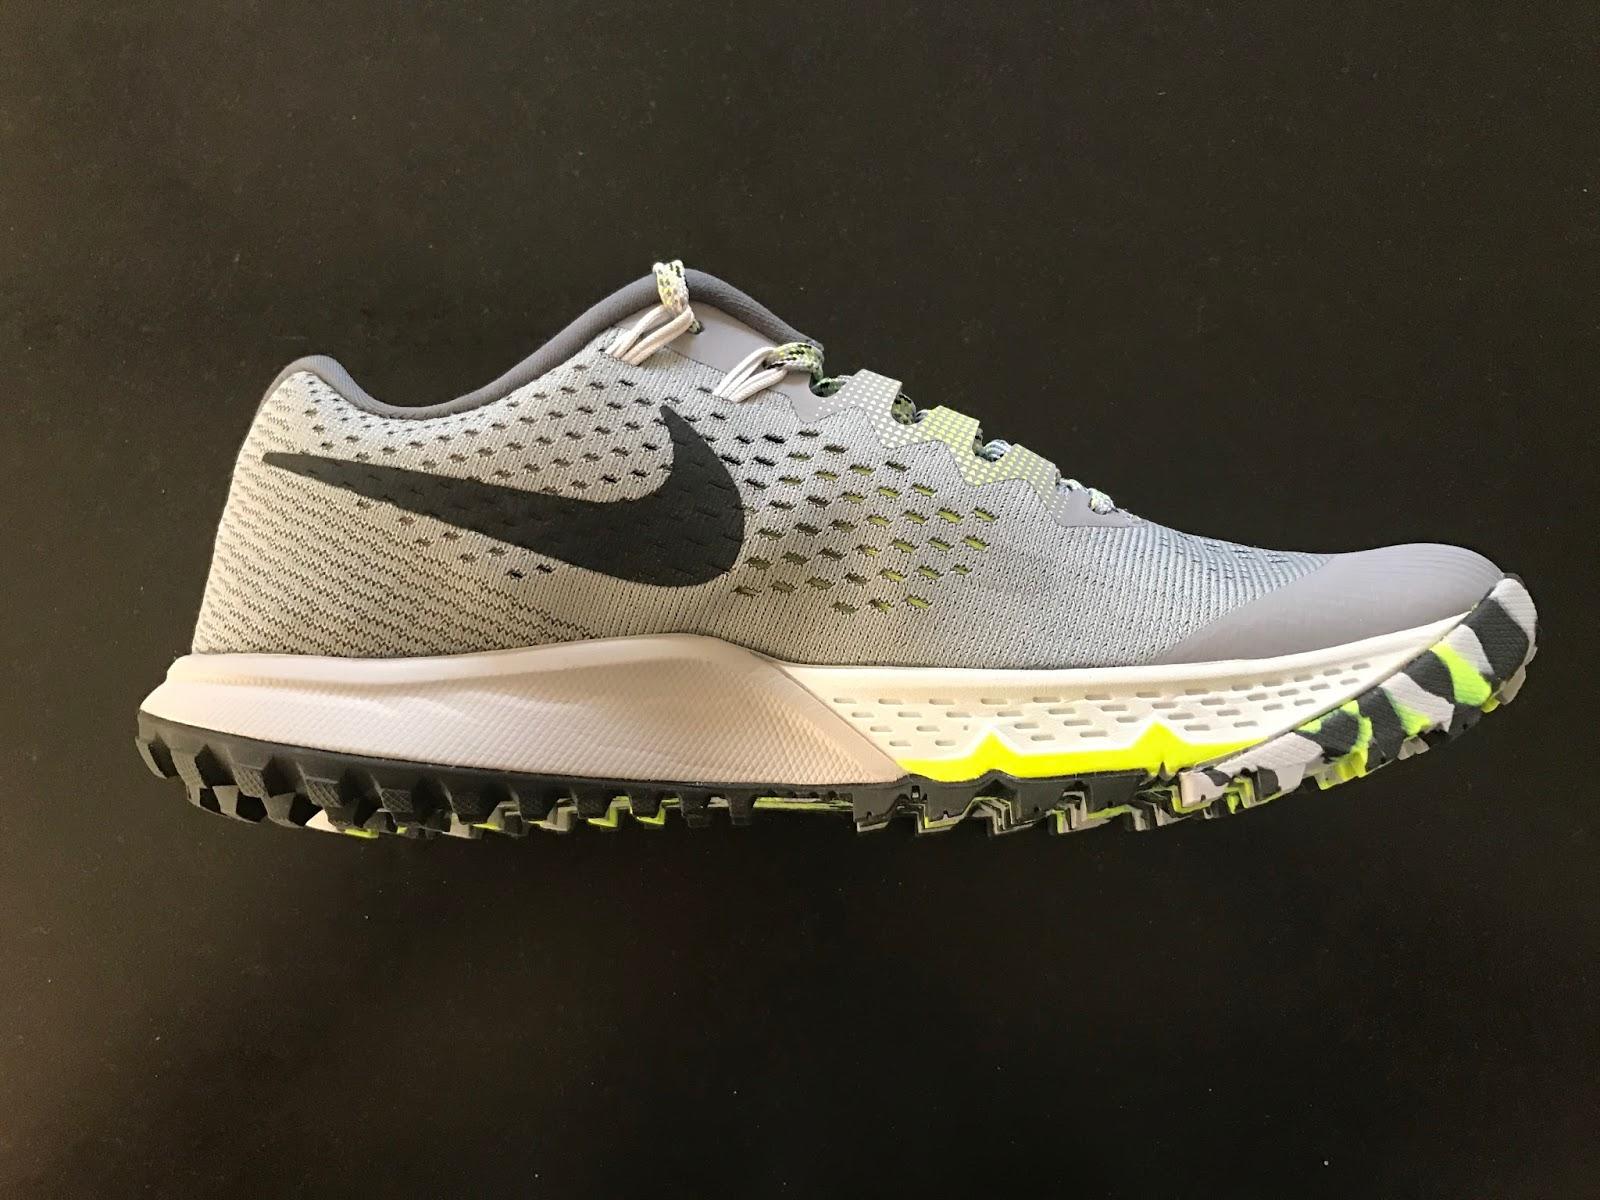 Road Trail Run Nike Air Zoom Terra Kiger 4 Review A Favorite